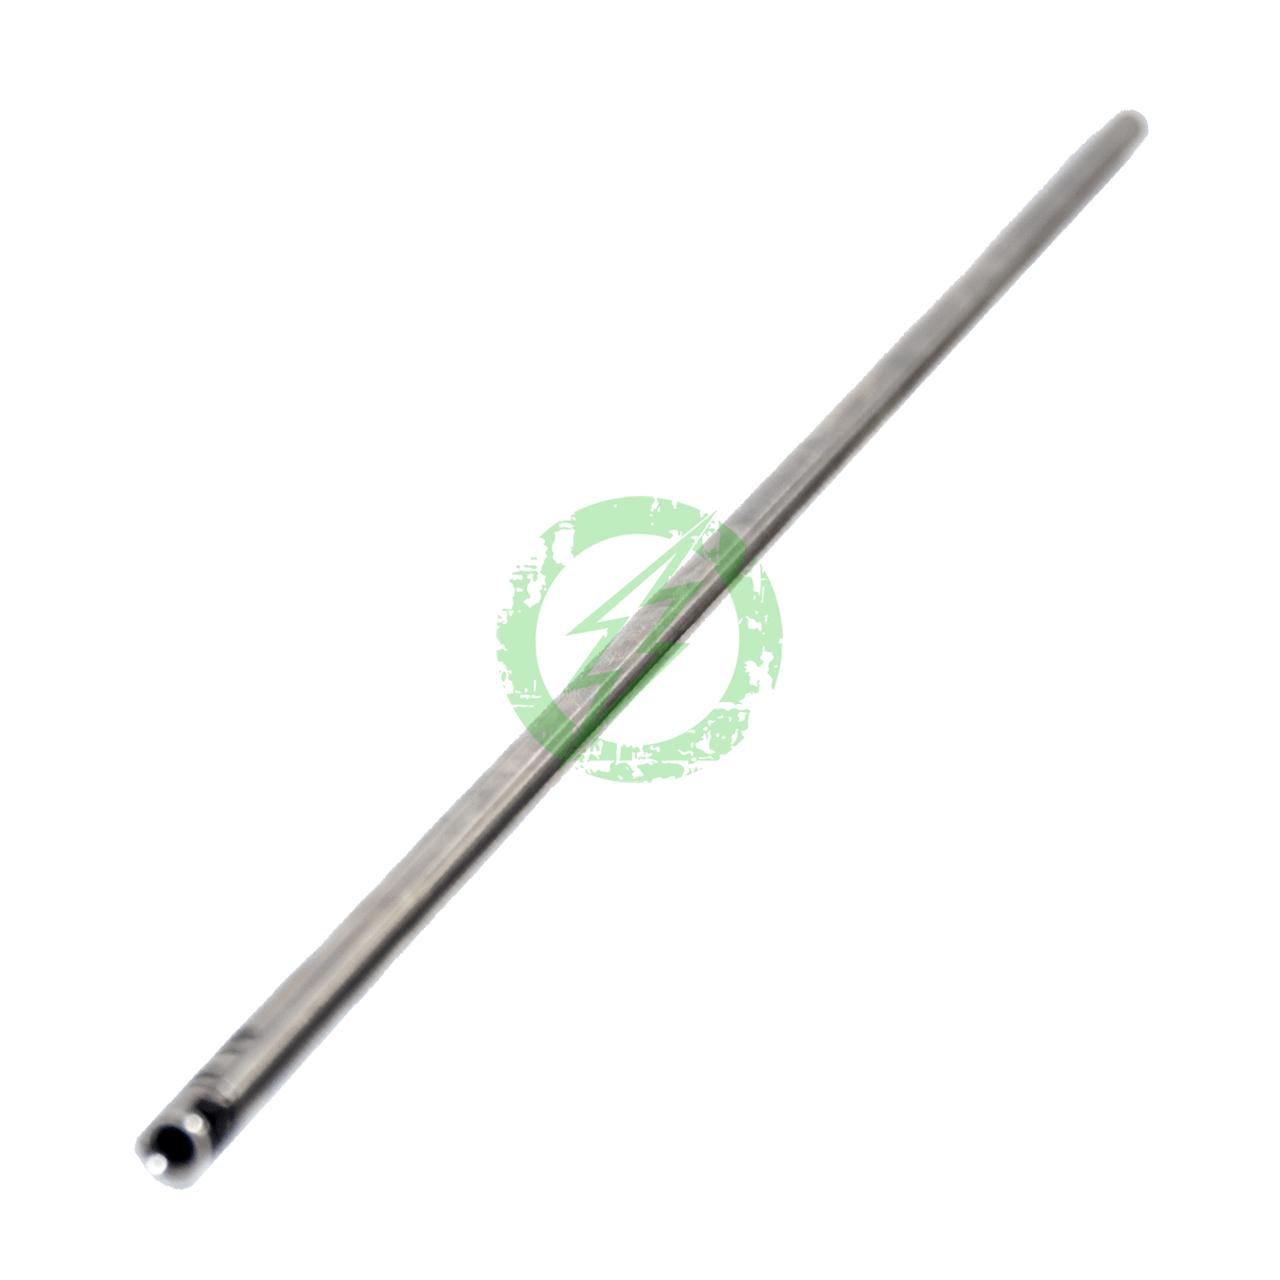 Action Army 6.03mm Precision Tight Bore AEG Inner Barrel | 250mm - 510mm medium